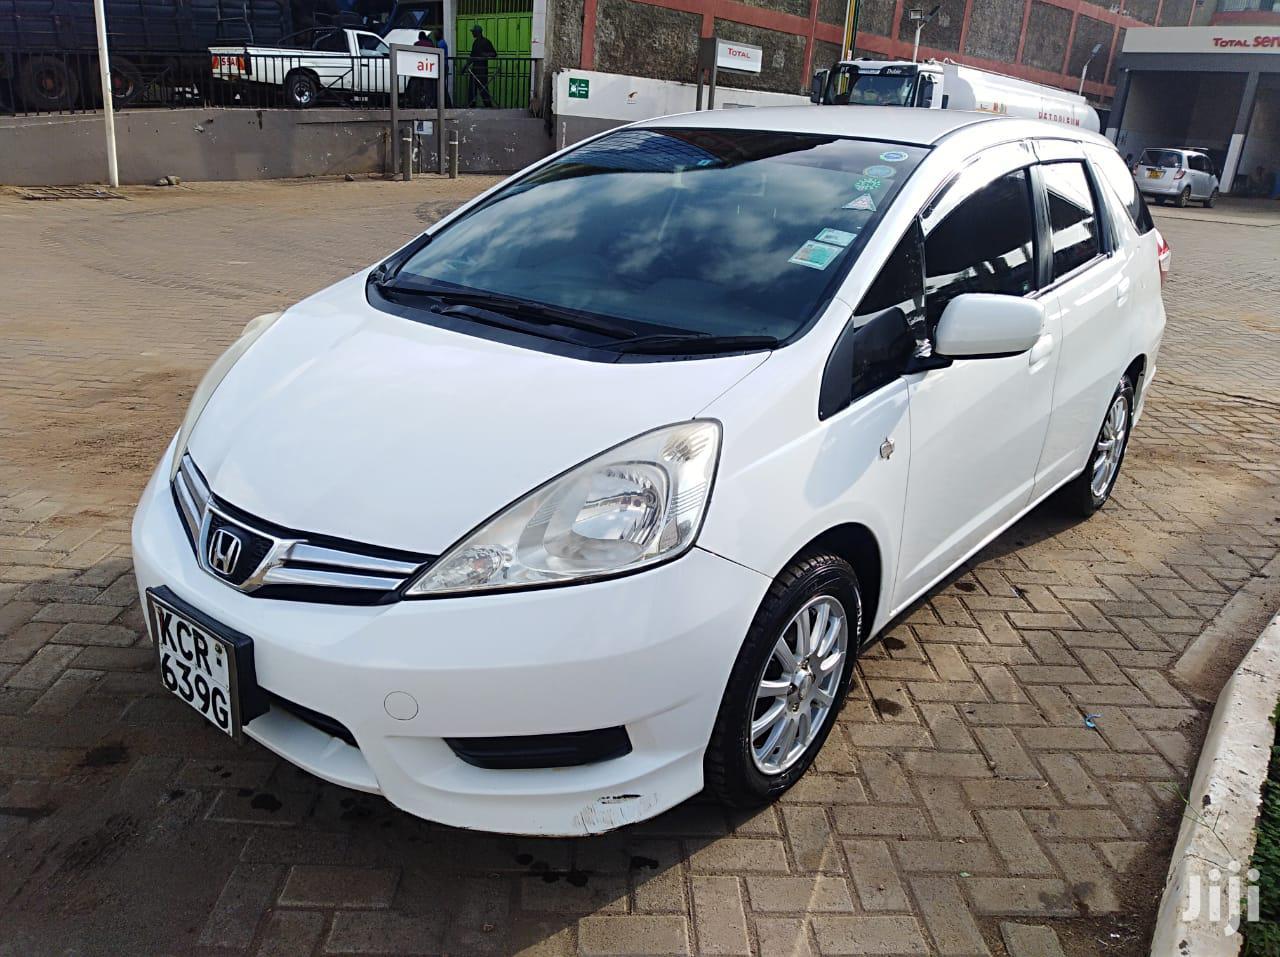 Honda Shuttle 2011 White in Nairobi Central - Cars, Anthony Njuguna   Jiji.co.ke for sale in ...